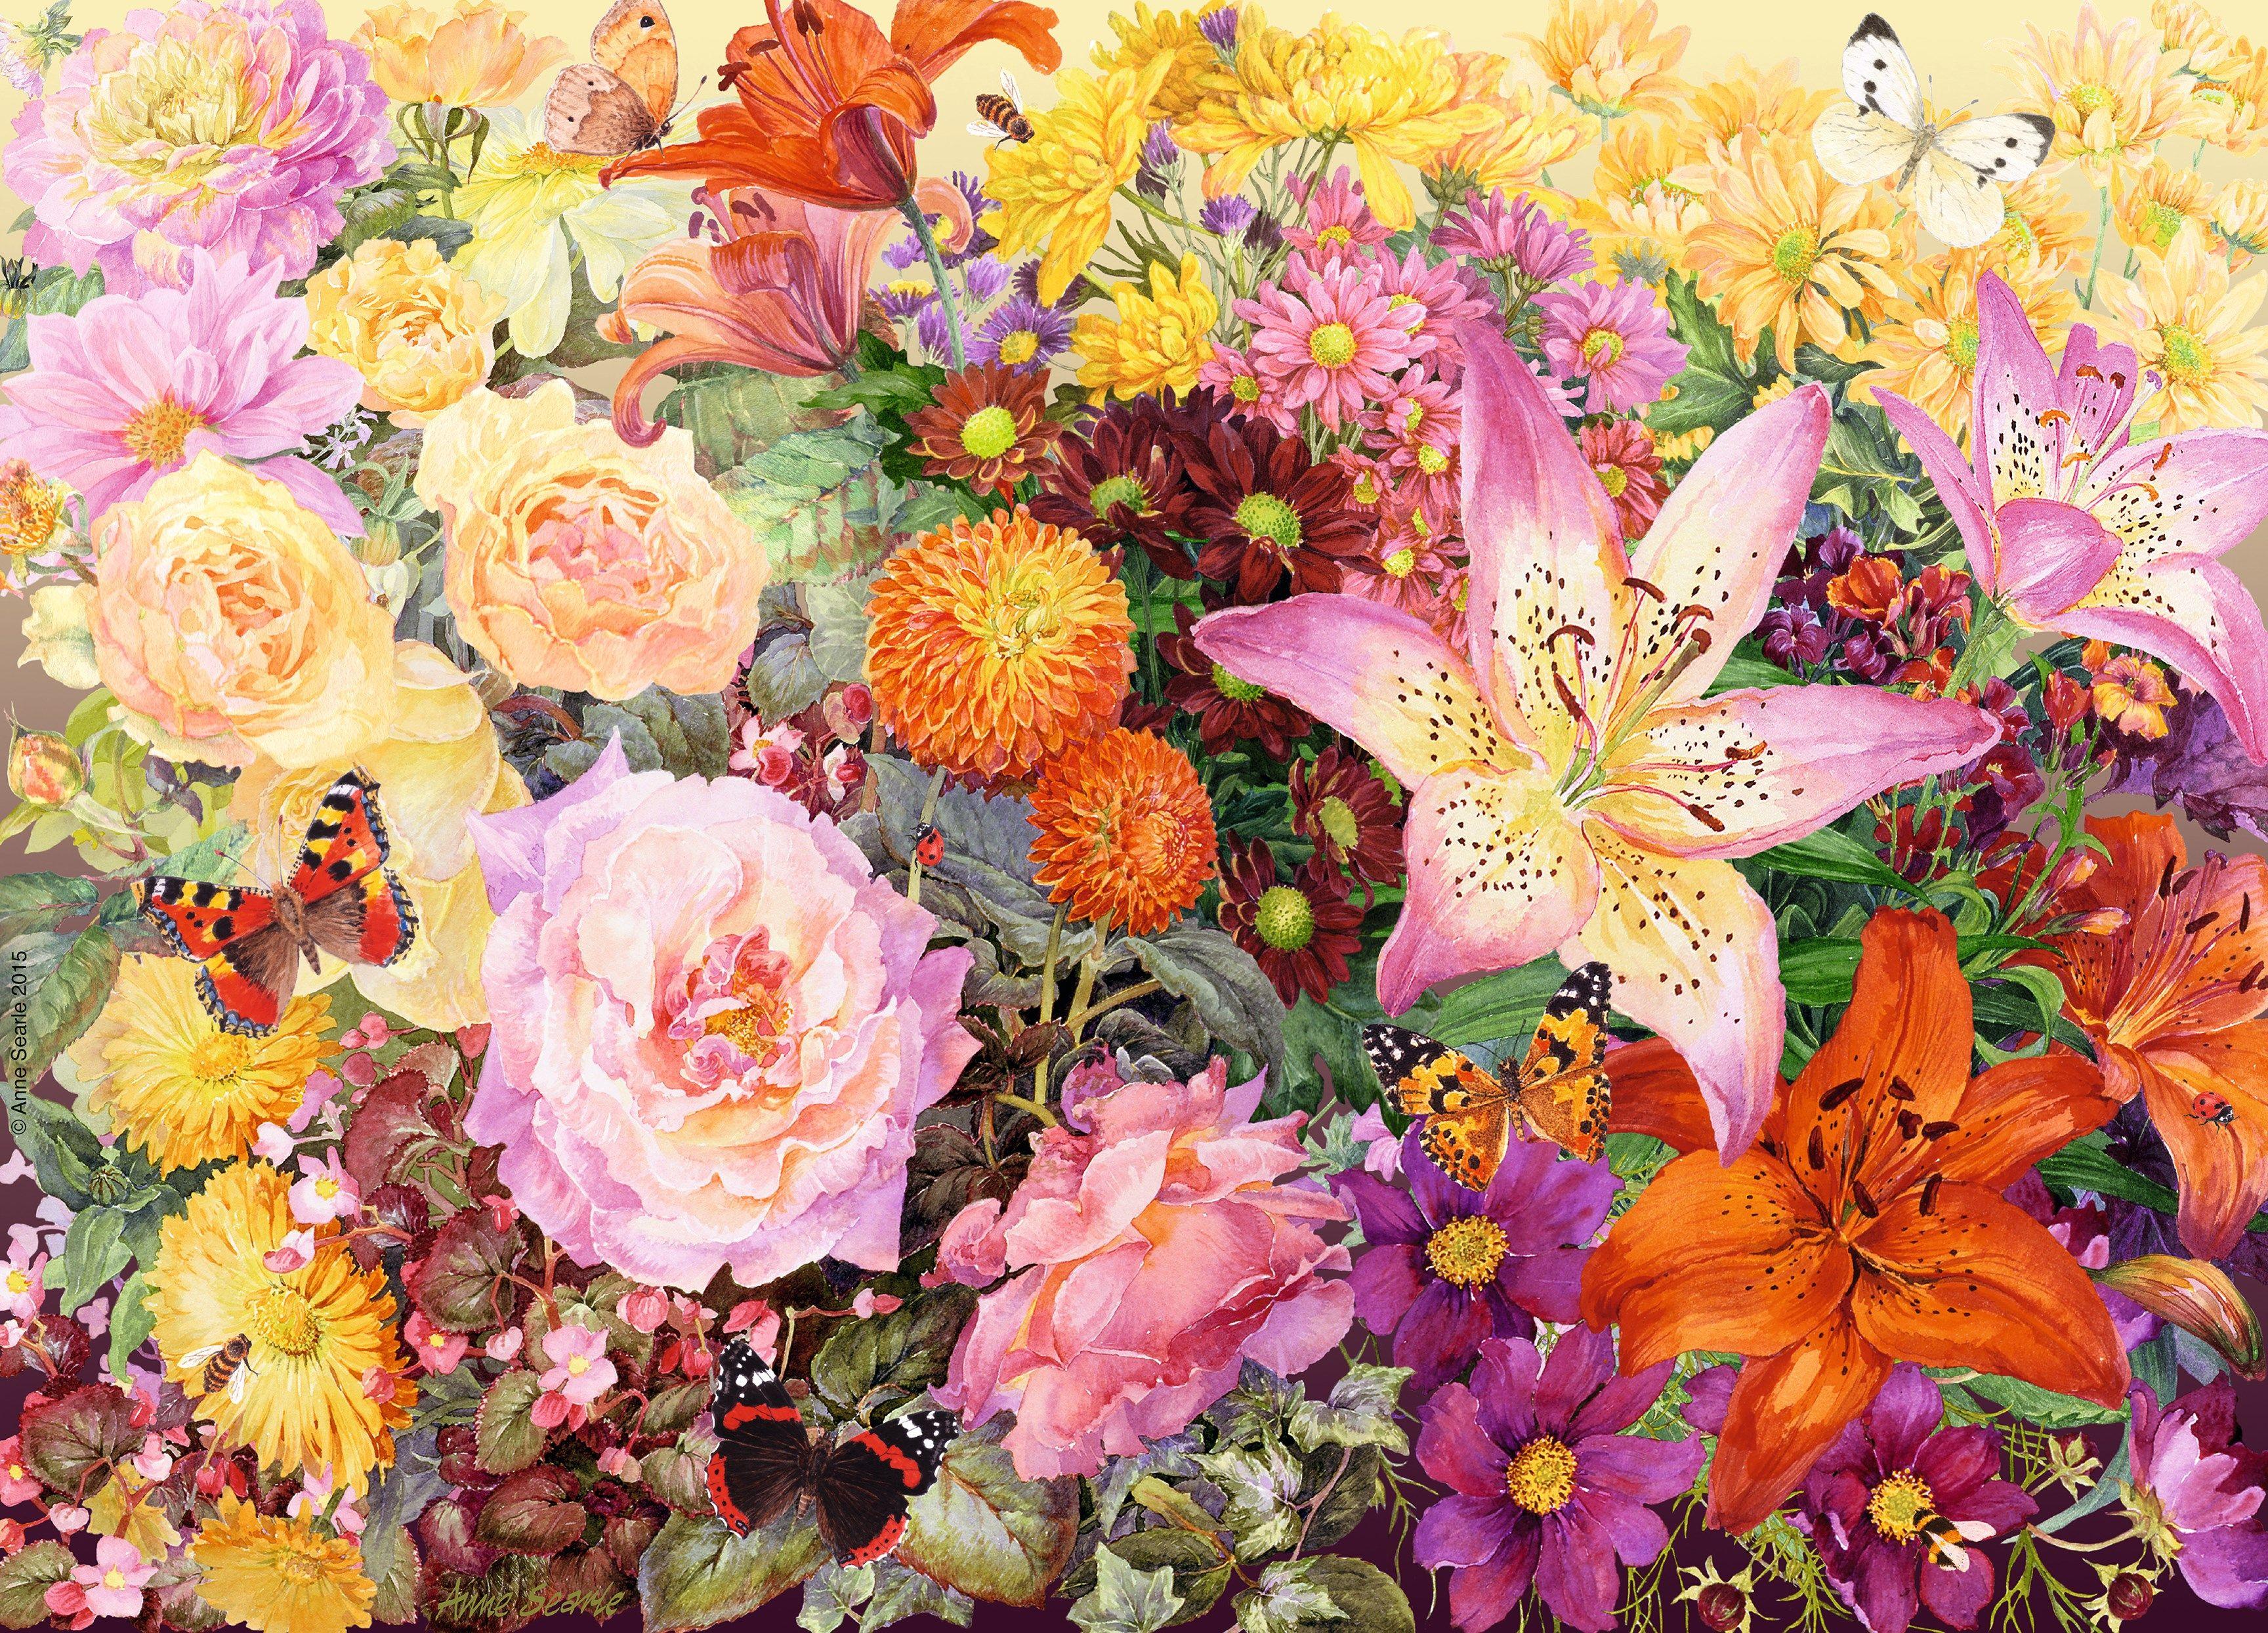 #1409797, HQ RES flower image